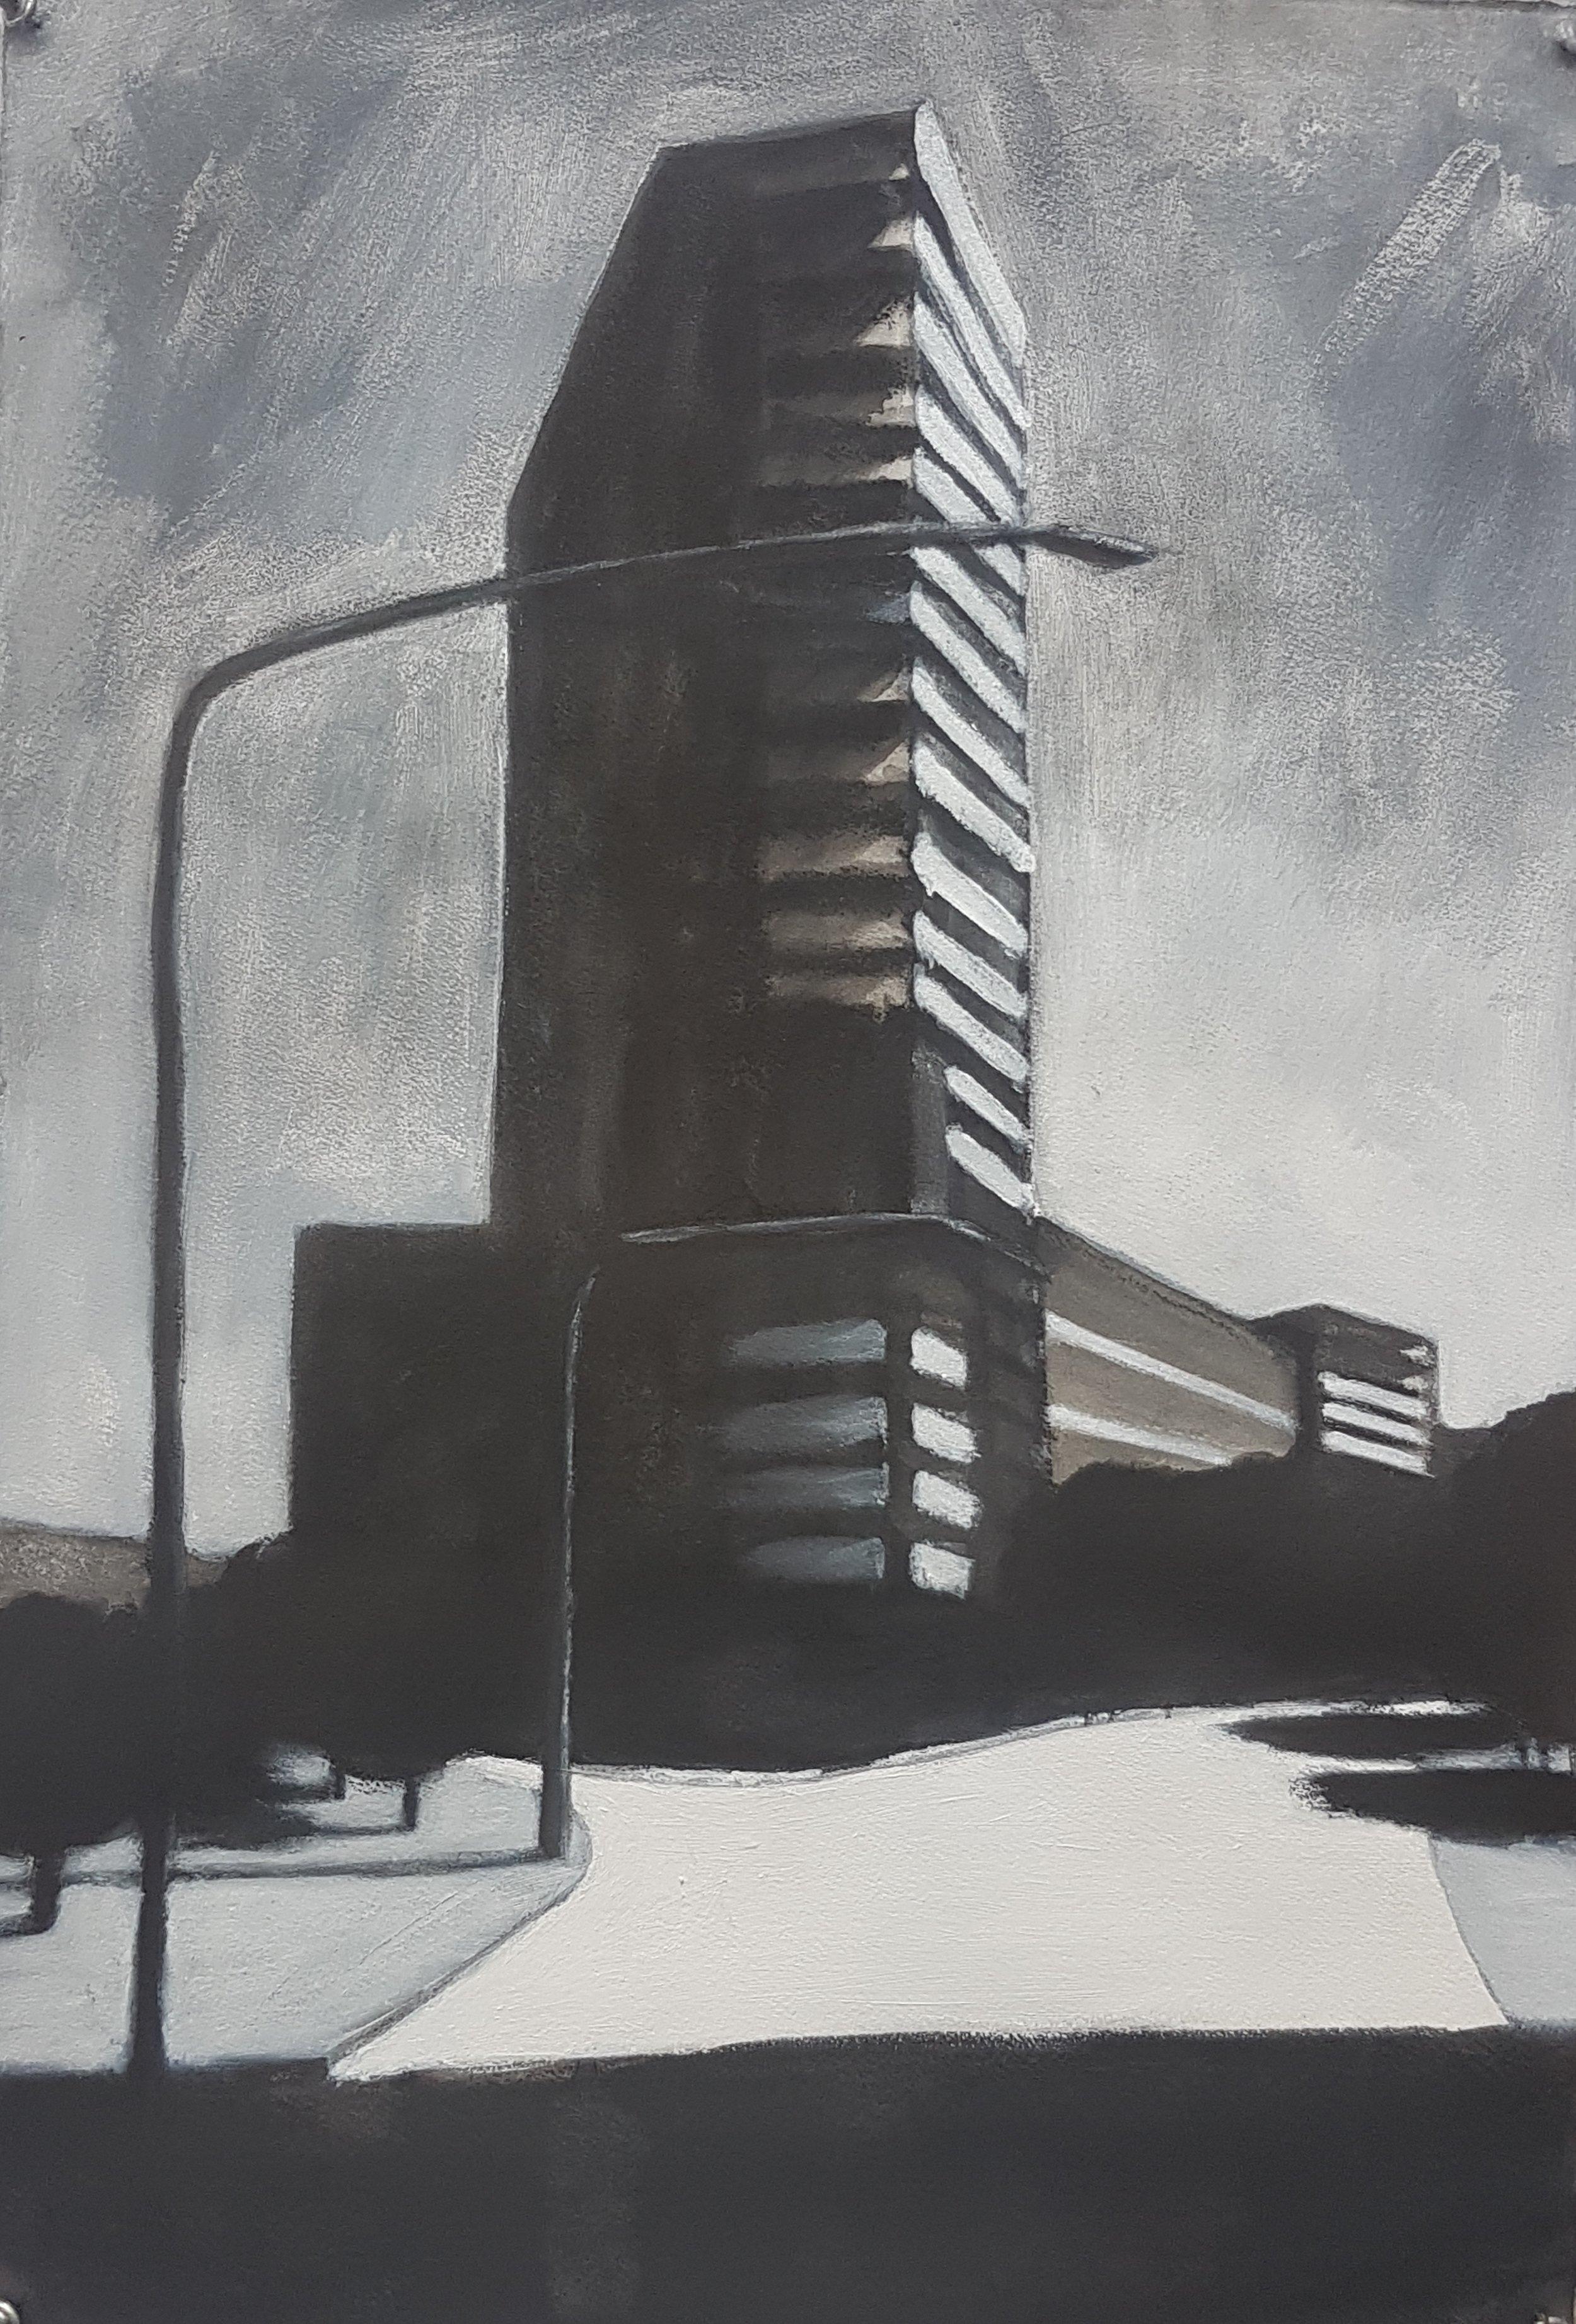 2018-003 Zetland Tower